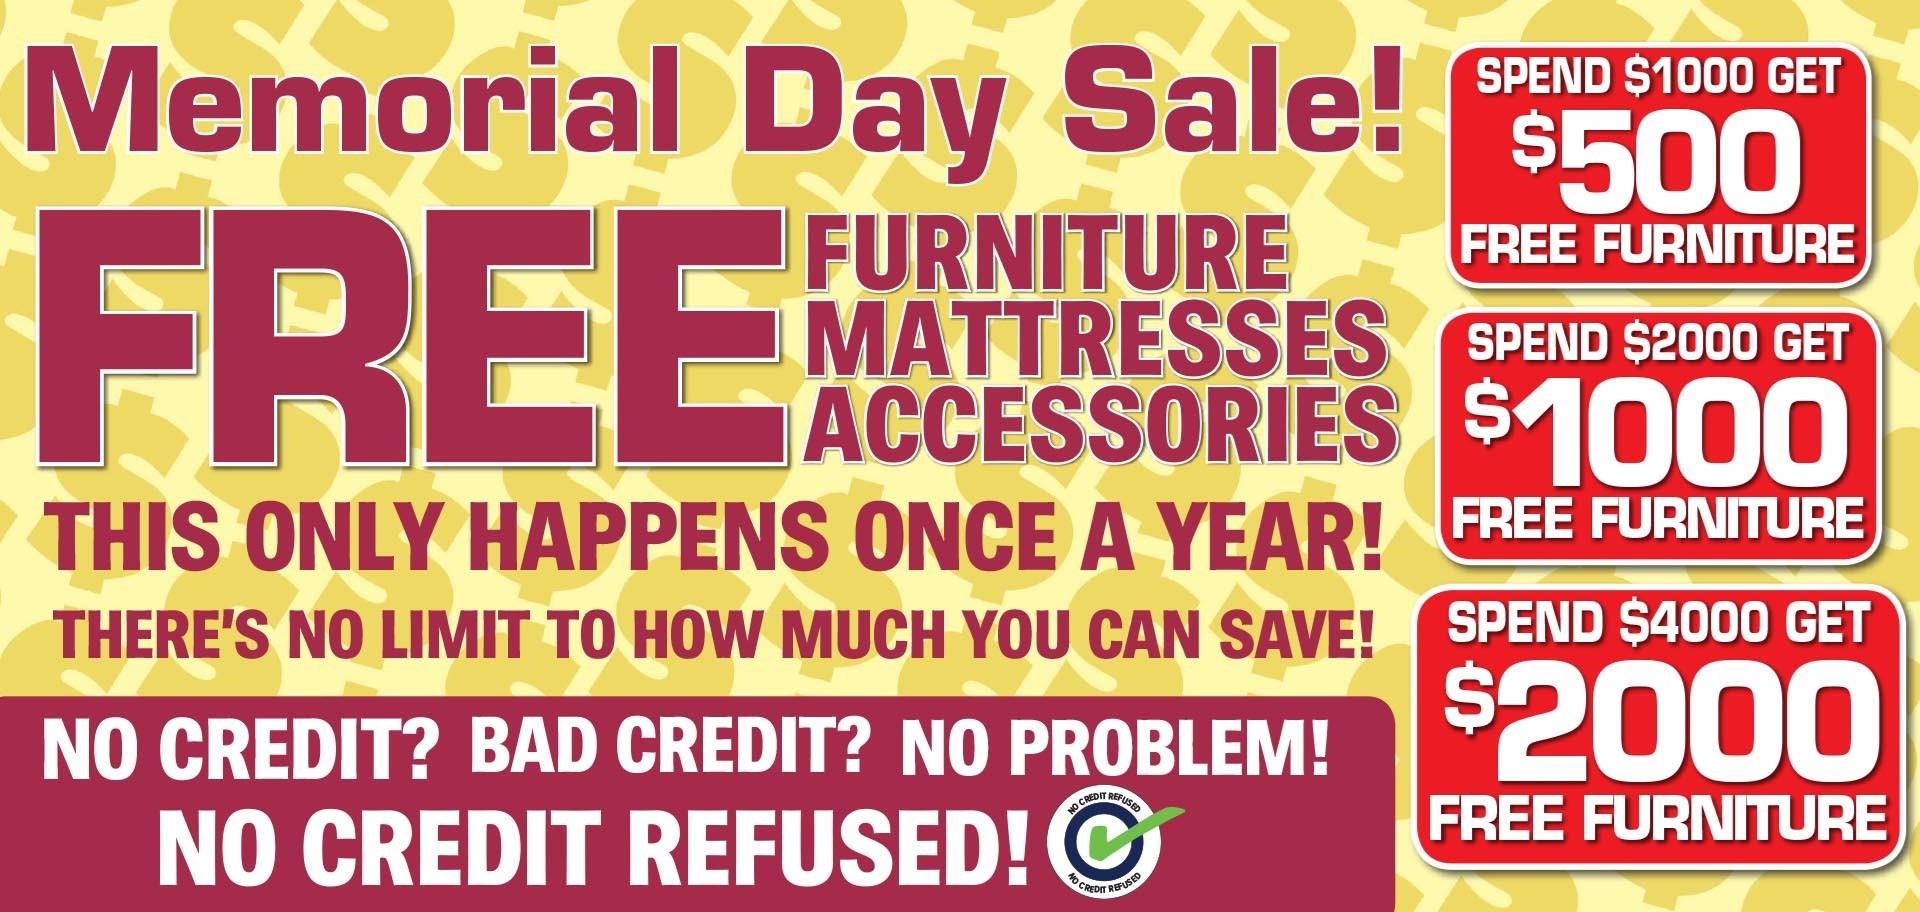 Free Furniture!!!